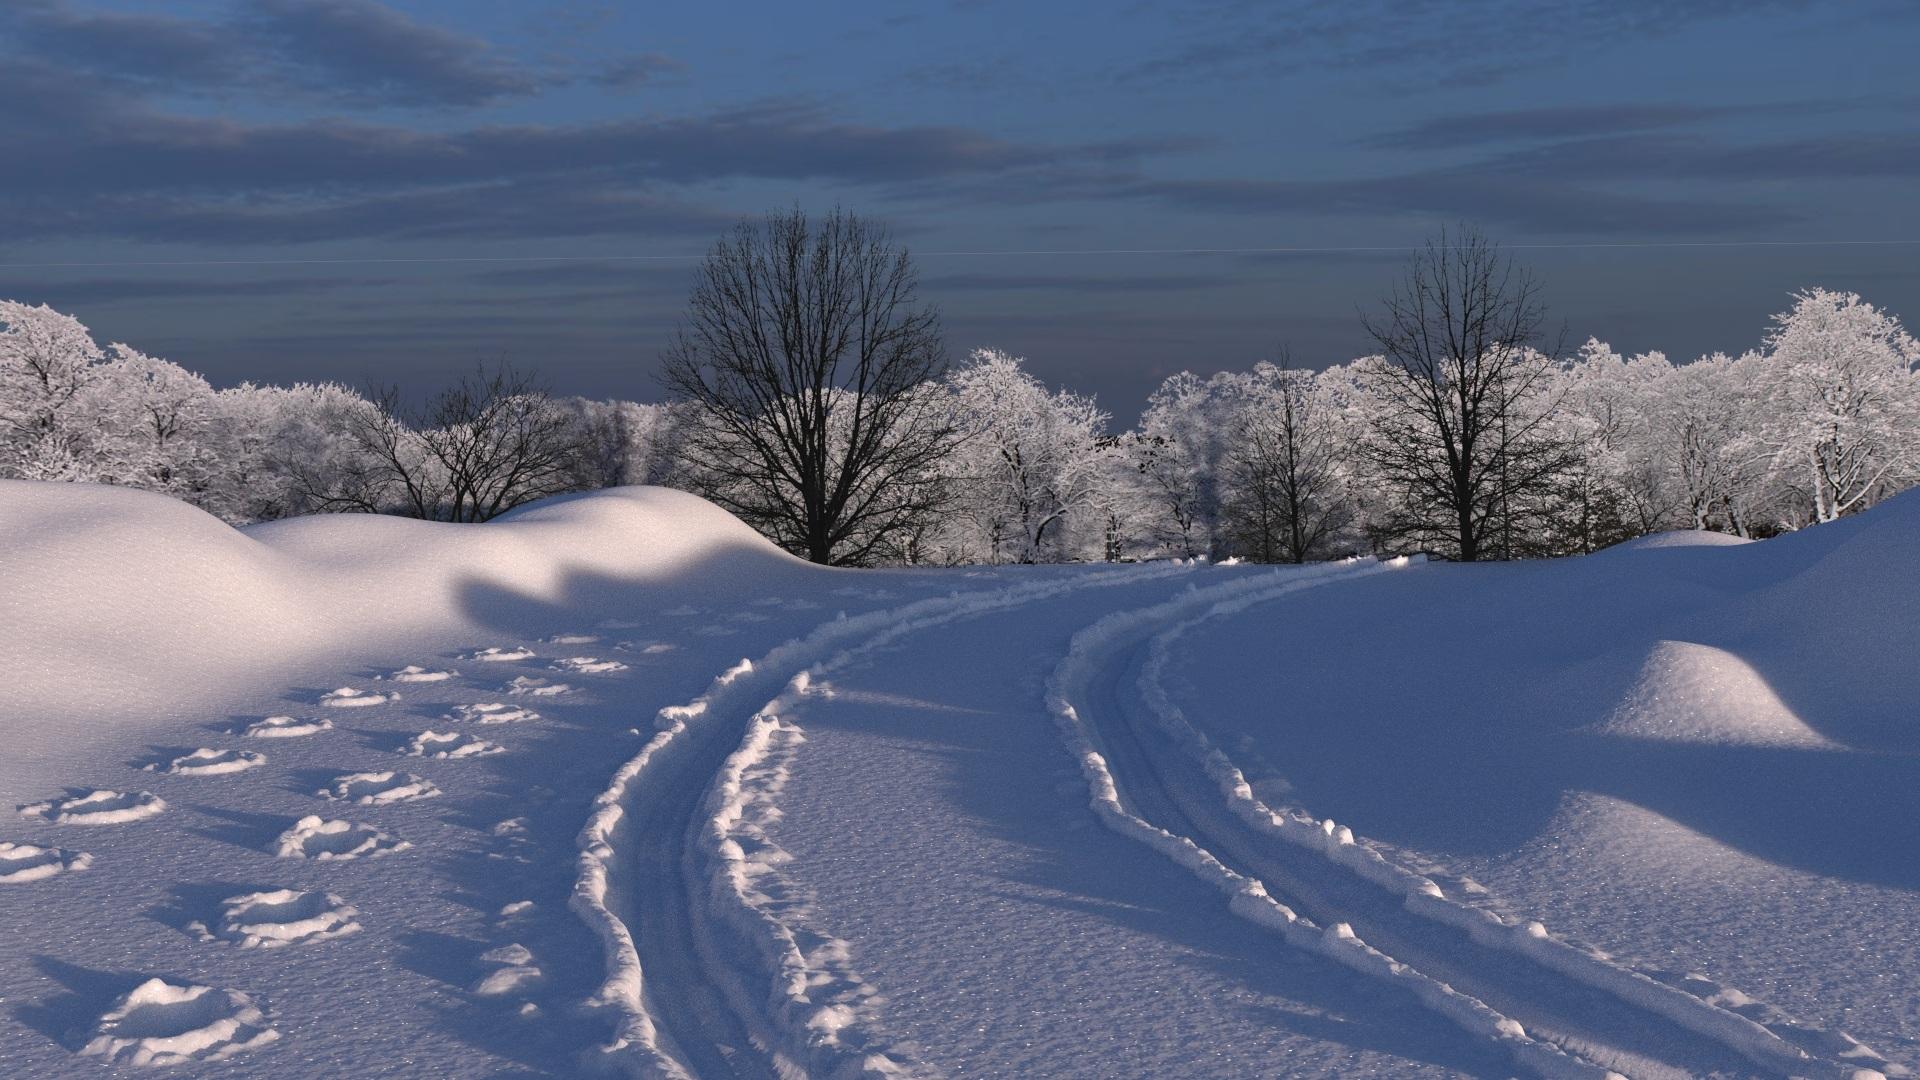 images gratuites montagne neige hiver route voiture. Black Bedroom Furniture Sets. Home Design Ideas